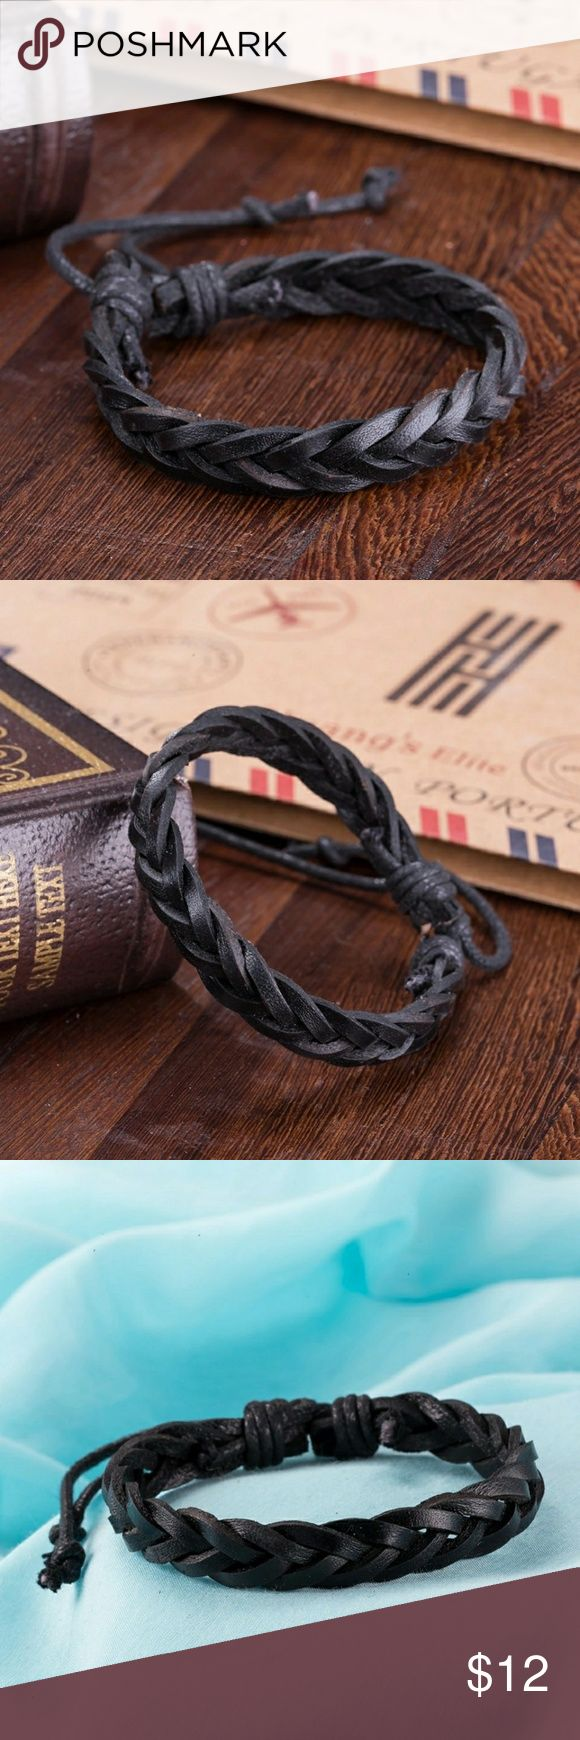 Men's leather braided bracelet Black leather bracelet Braided style Accessories Jewelry